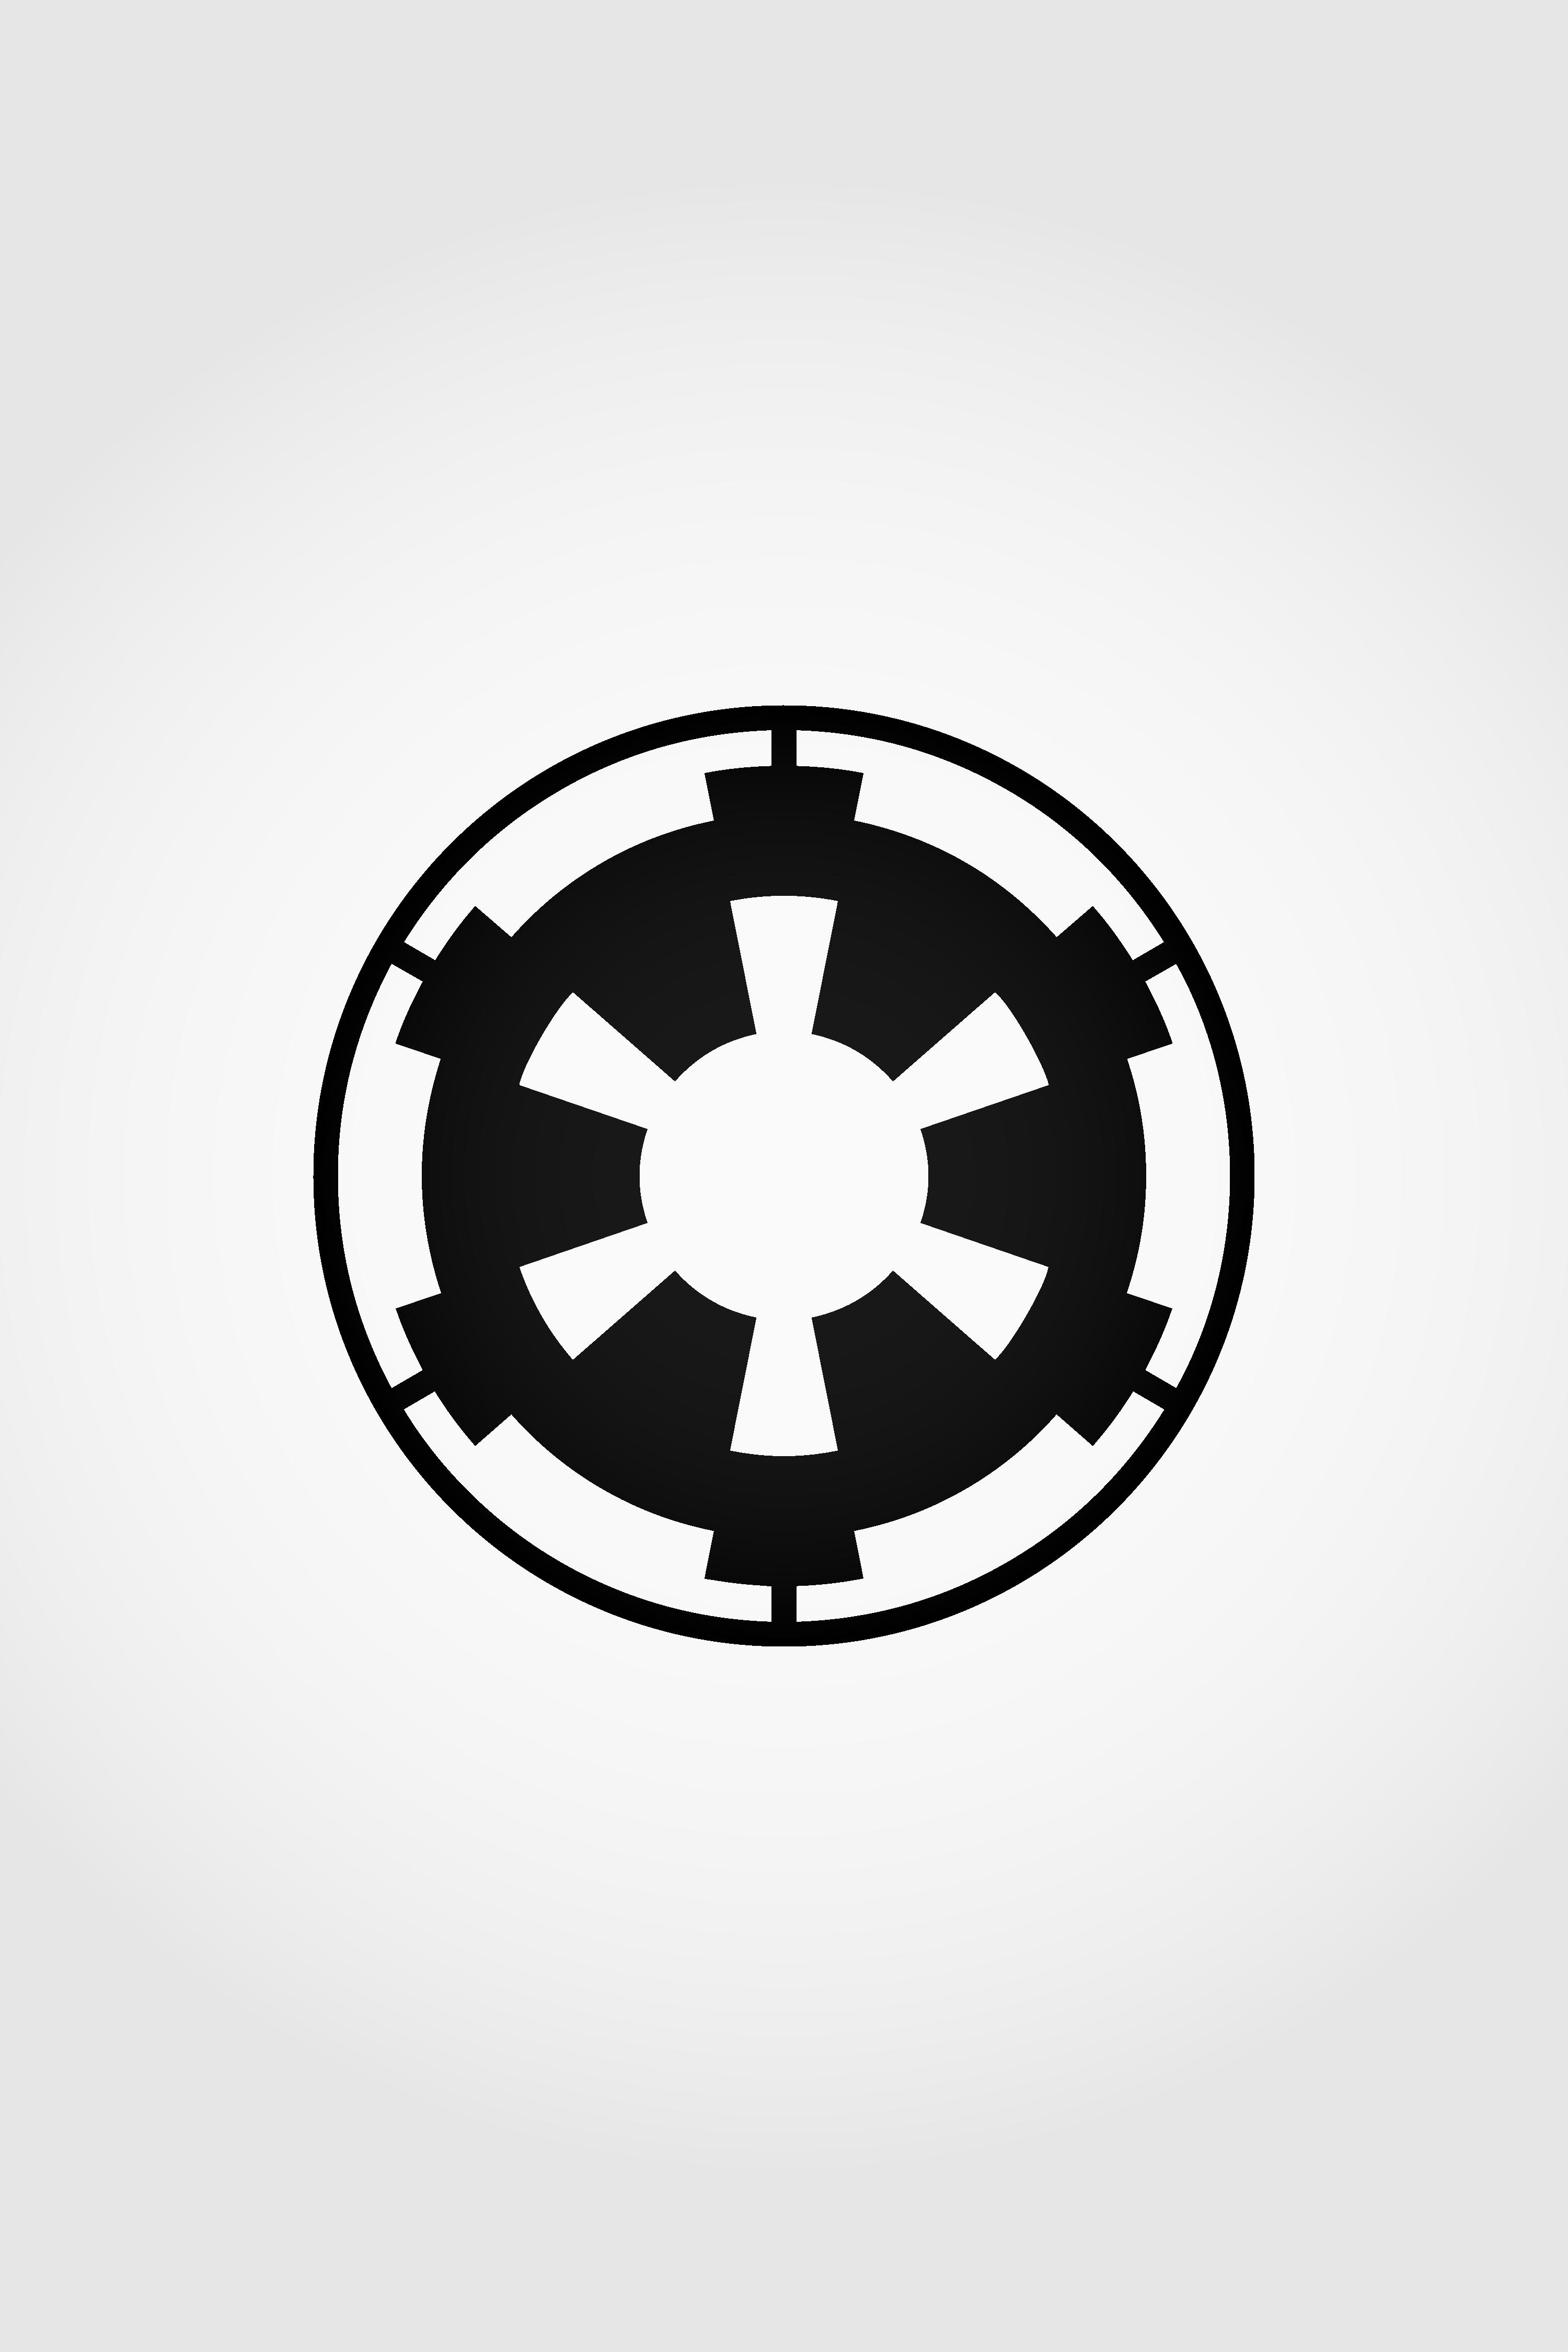 Logogami Shop Redbubble Galactic Empire Star Wars Empire Empire Symbol